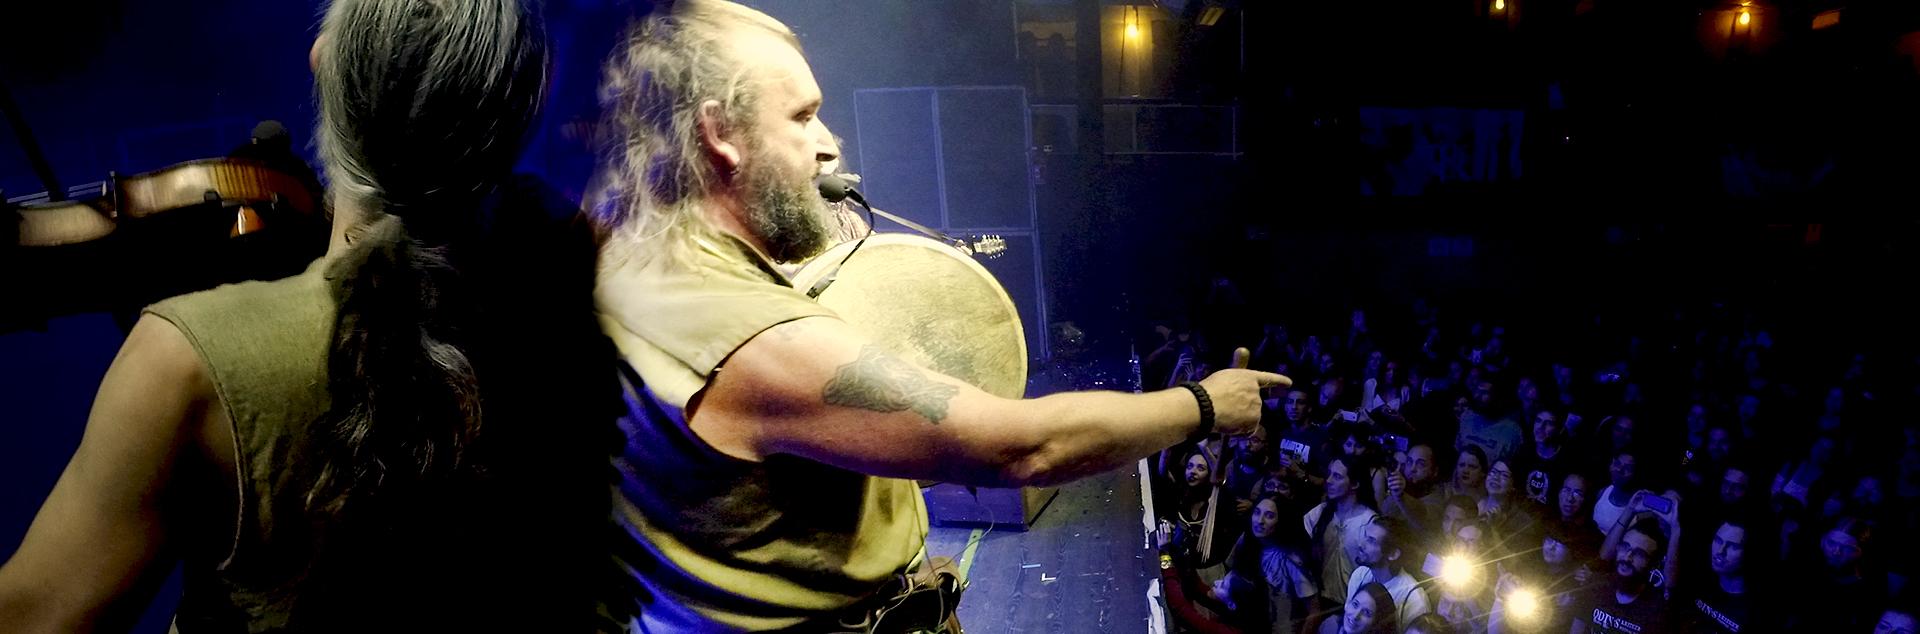 Johnnie-Cope-at-Odin's-Krieger-Festival,-São-Paulo-Brazil-Rapalje-Celtic-Folk-Music